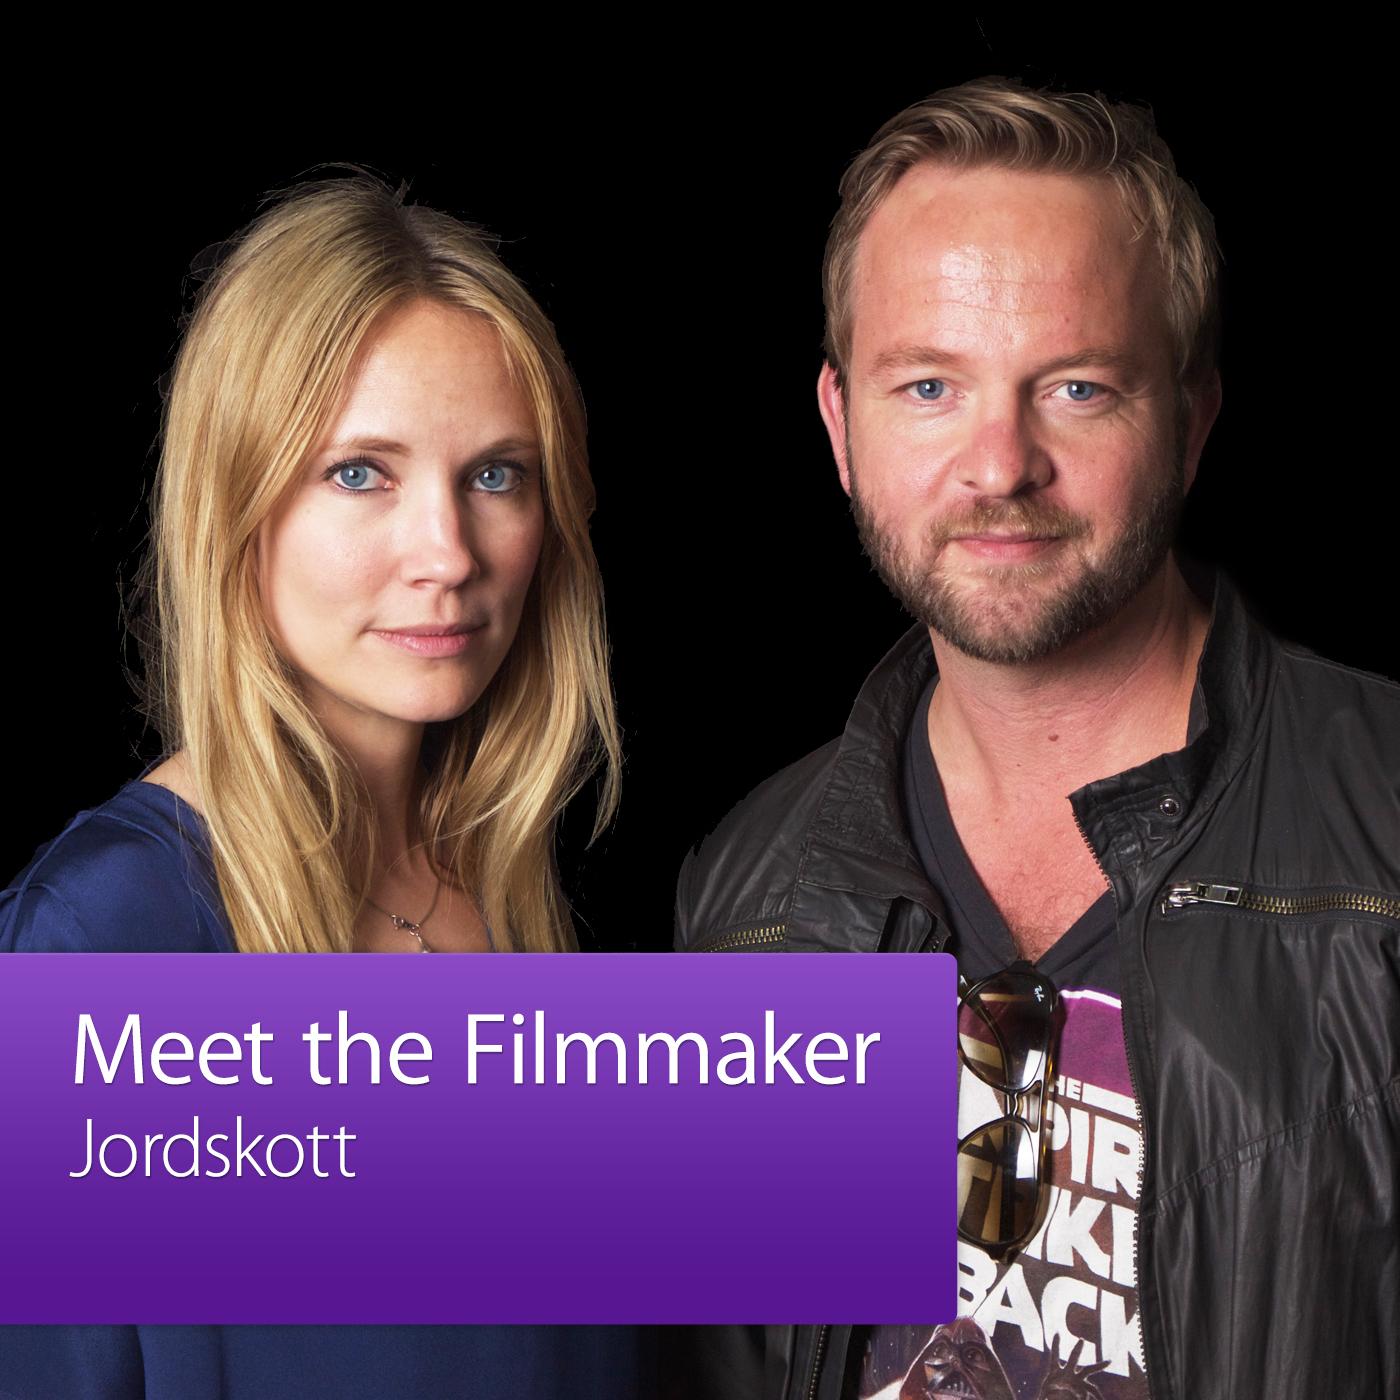 Jordskott: Meet the Filmmaker